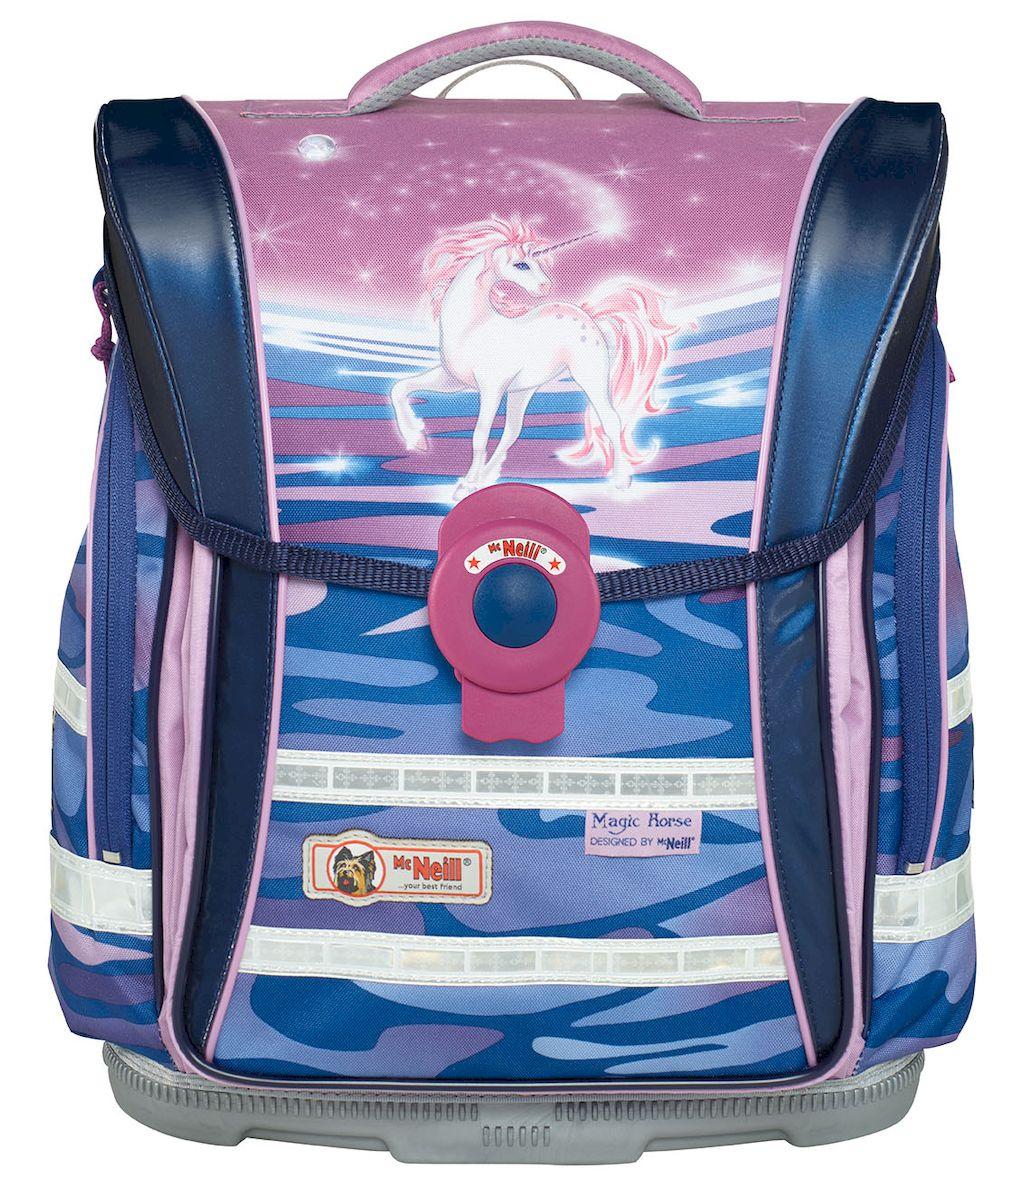 Mc Neill Ранец школьный Ergo Light Compact Единорог9604161000